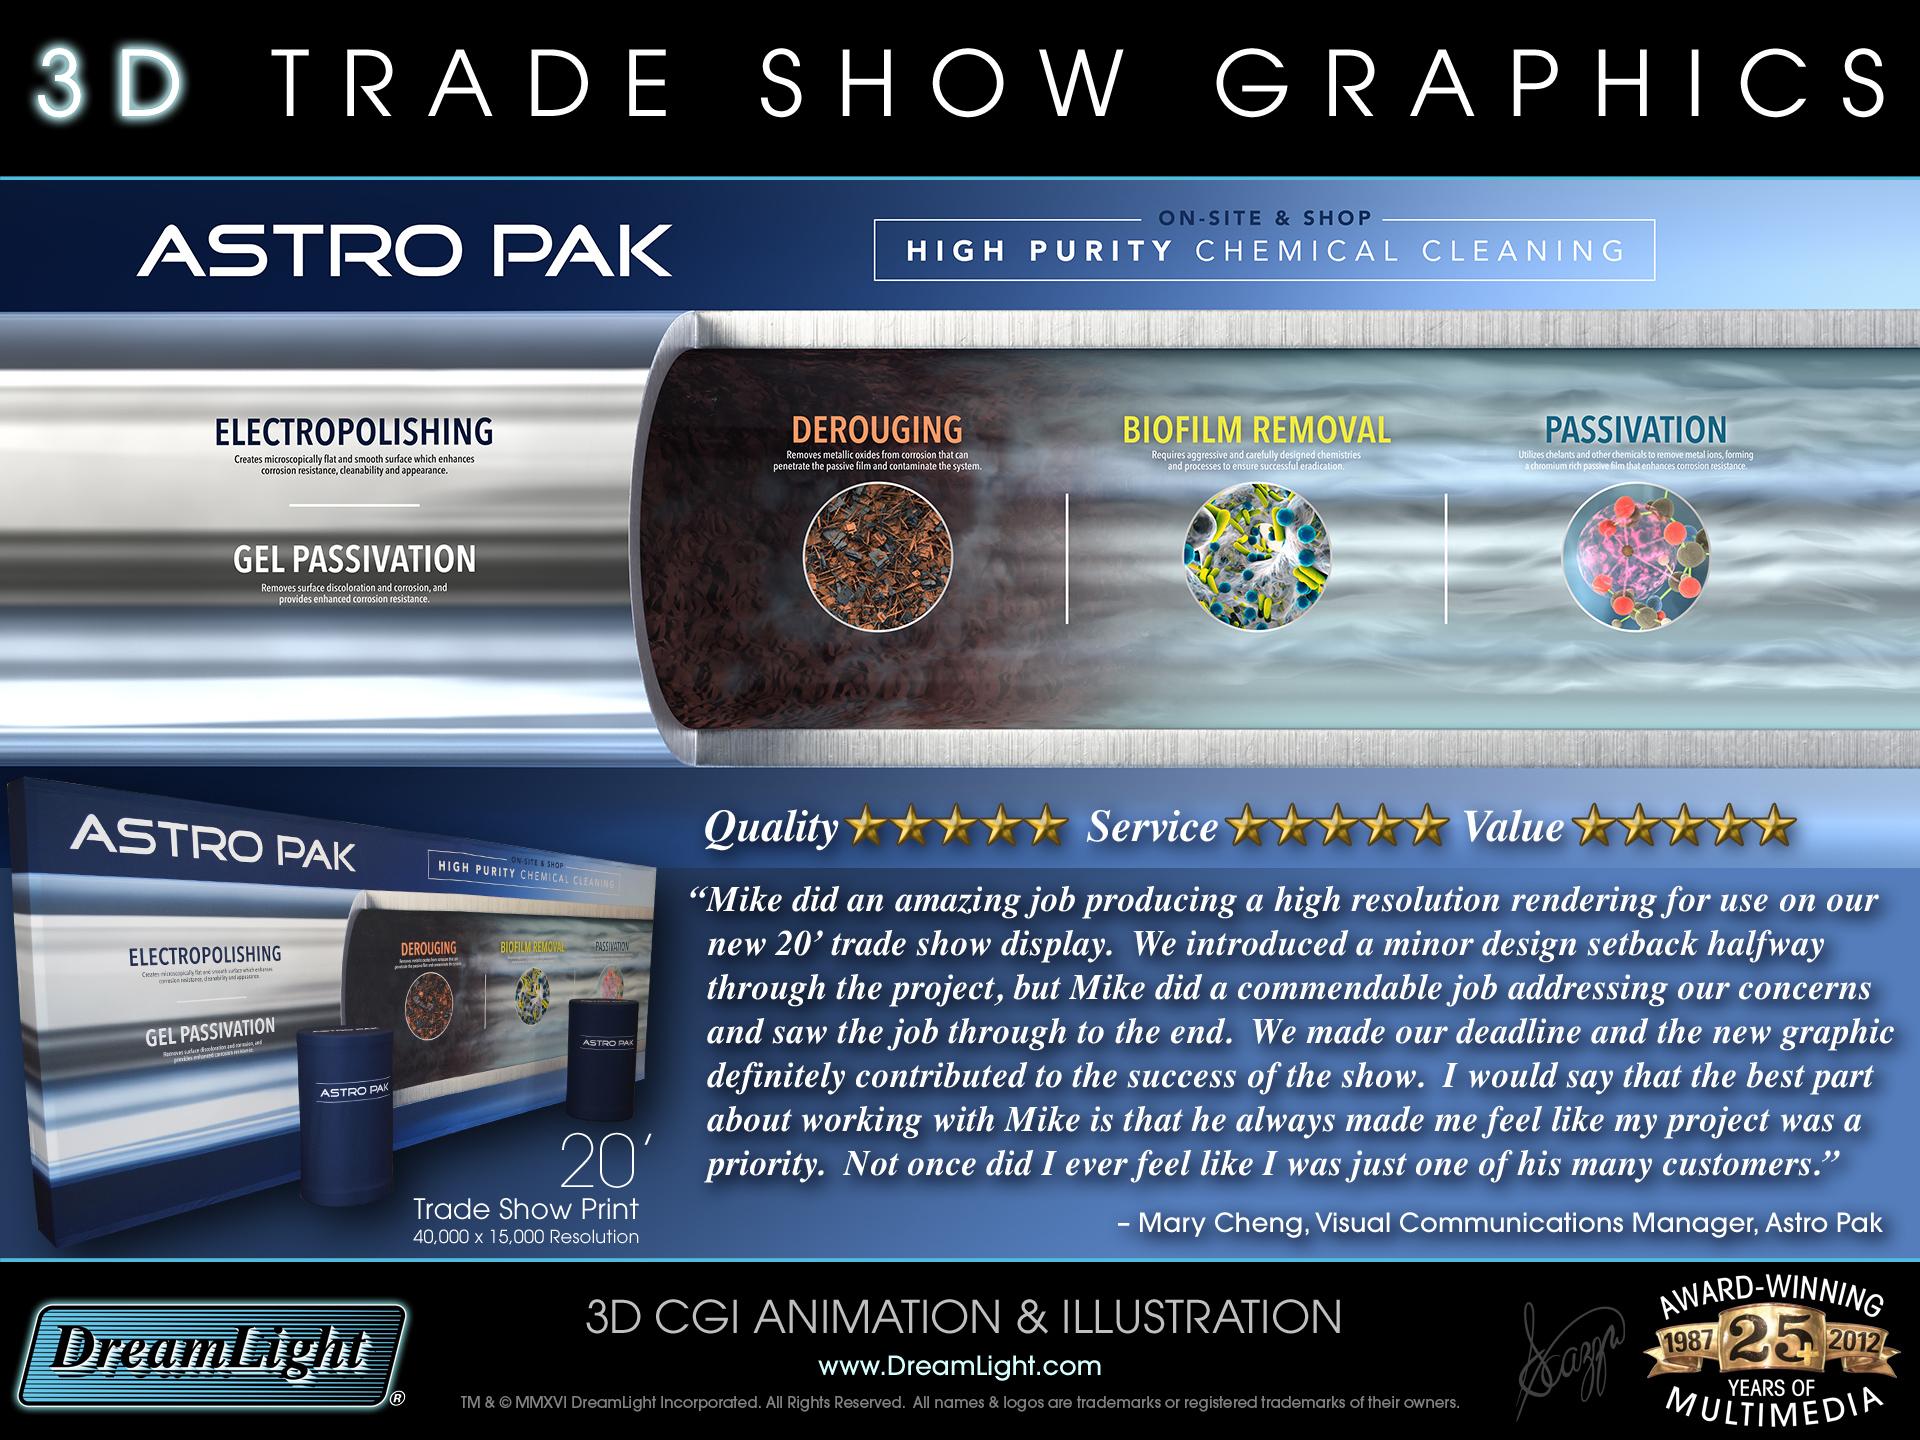 3D Trade Show Graphics